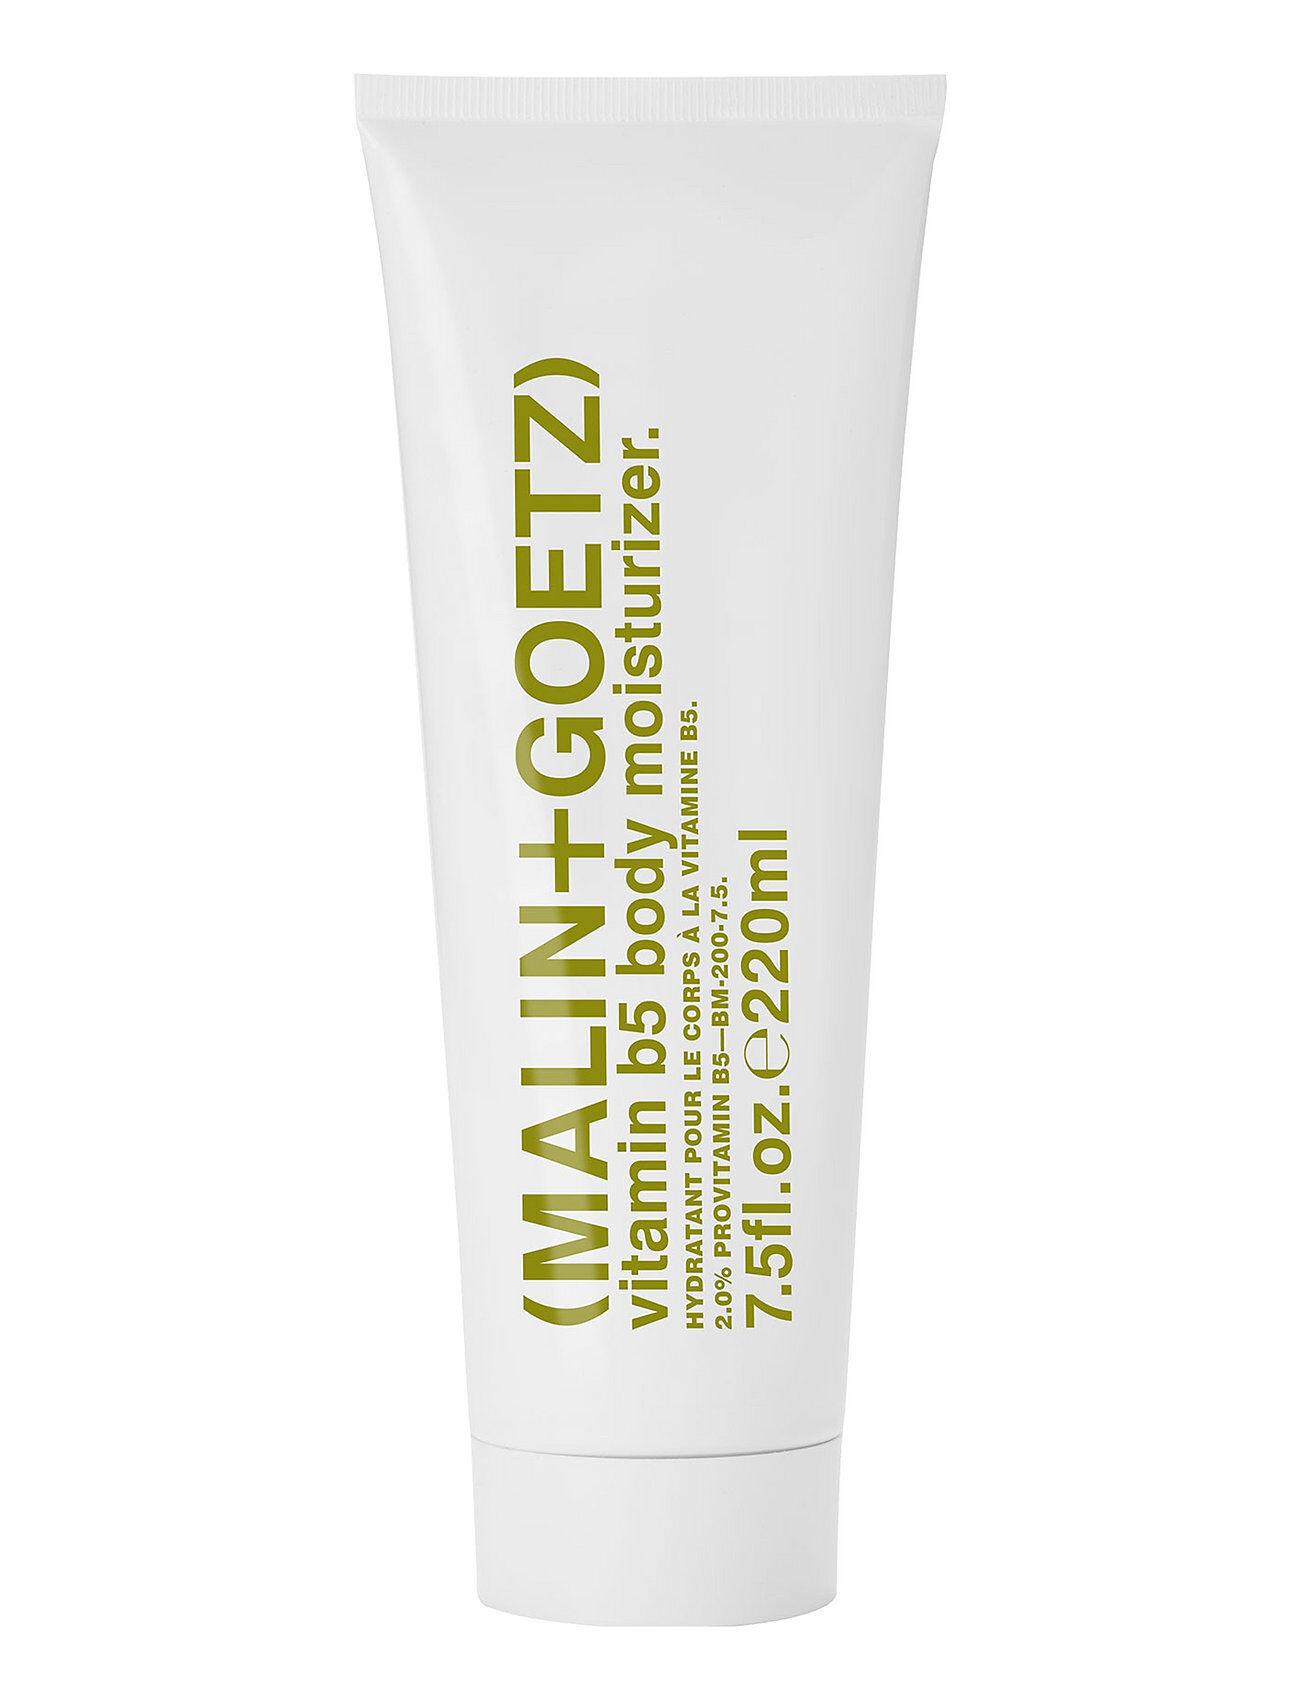 MALIN+GOETZ Vitamin B5 Body Moisturizer Kosteusvoide Vartalo Nude MALIN+GOETZ